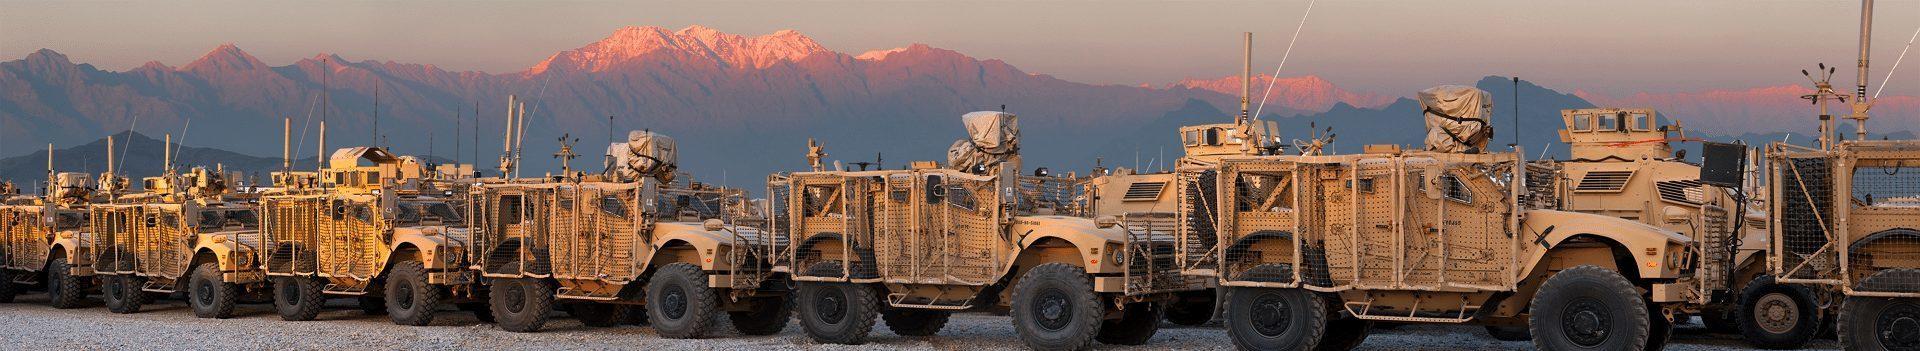 Panoramic MRAPs cropped v1